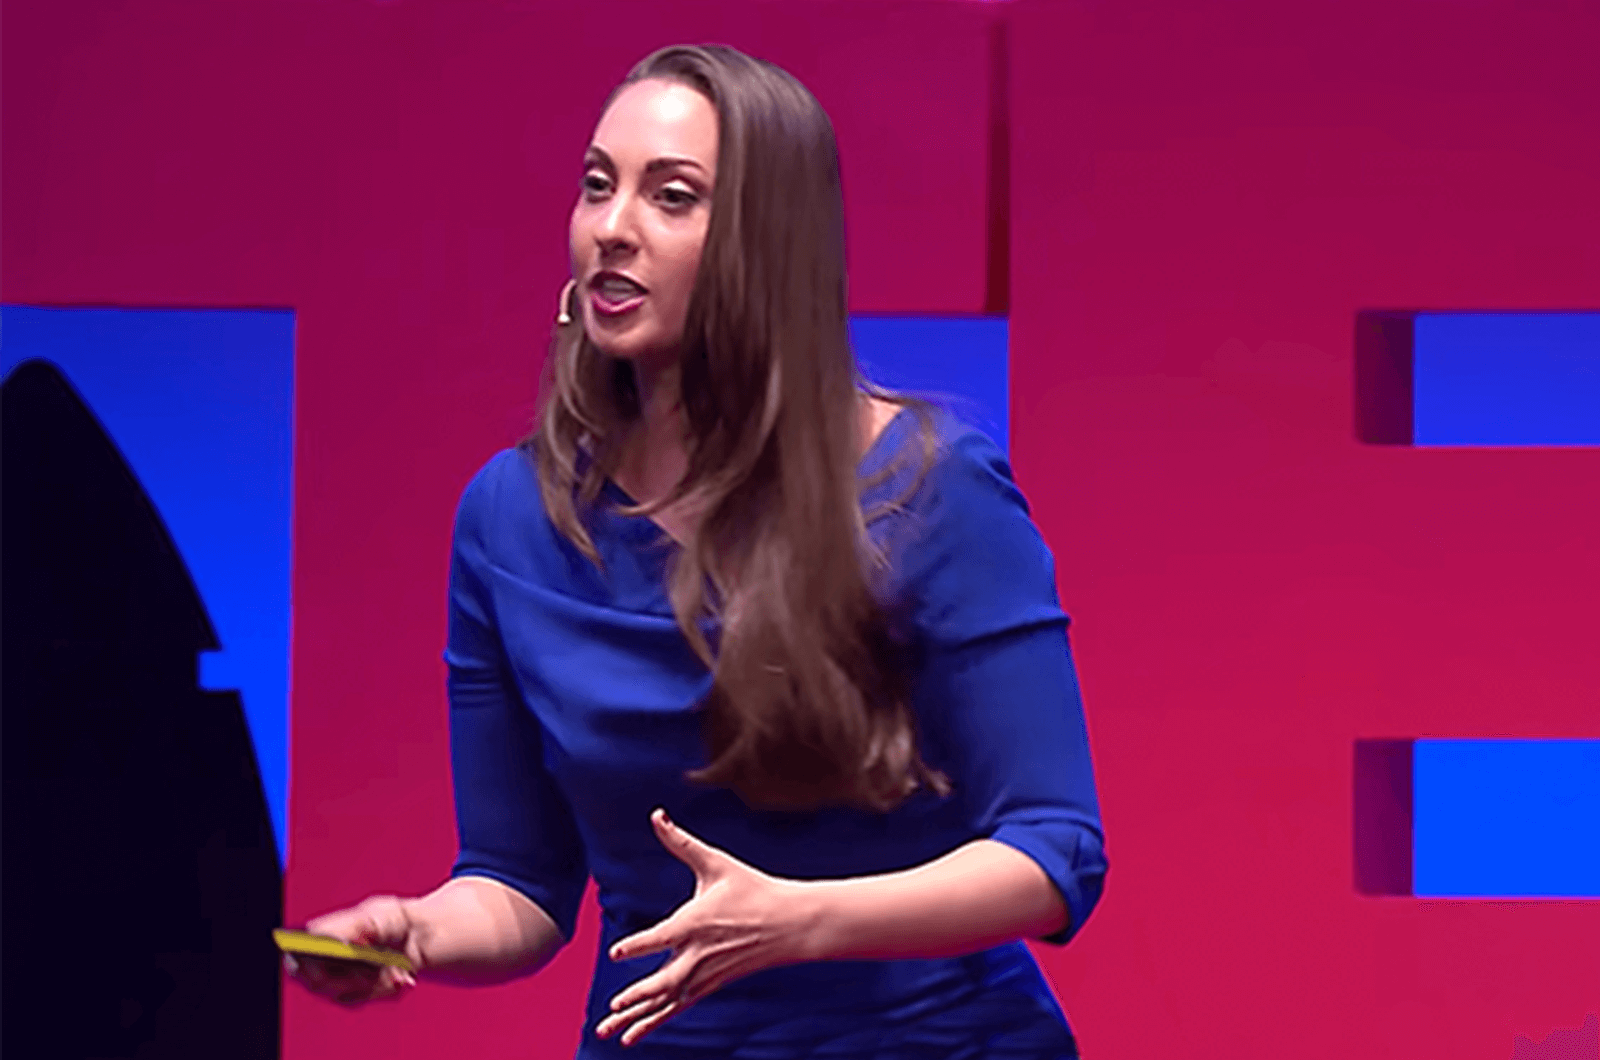 Woman in blue dress speaking onstage.